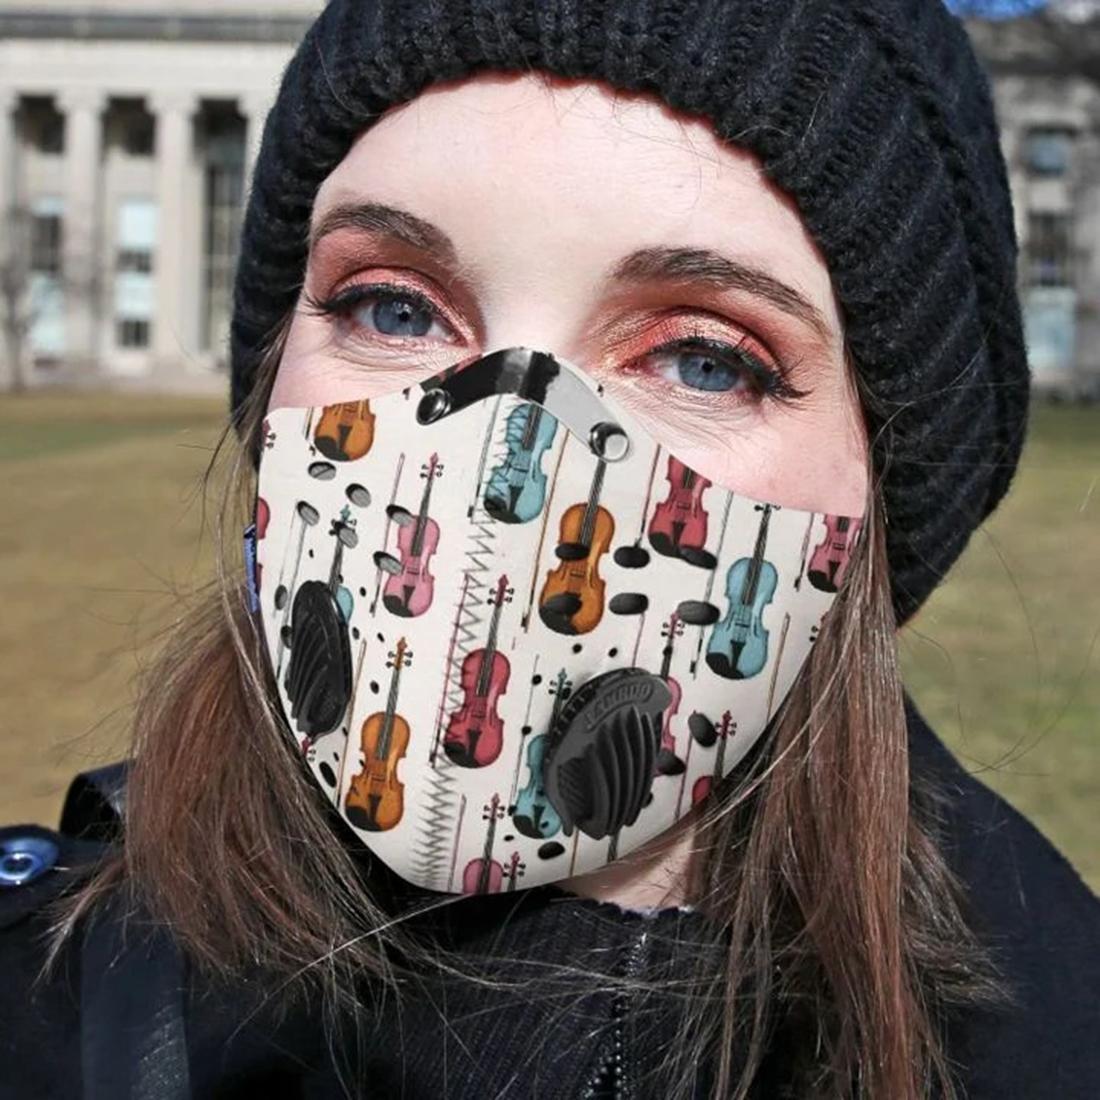 Violin filter face mask - Picture 1